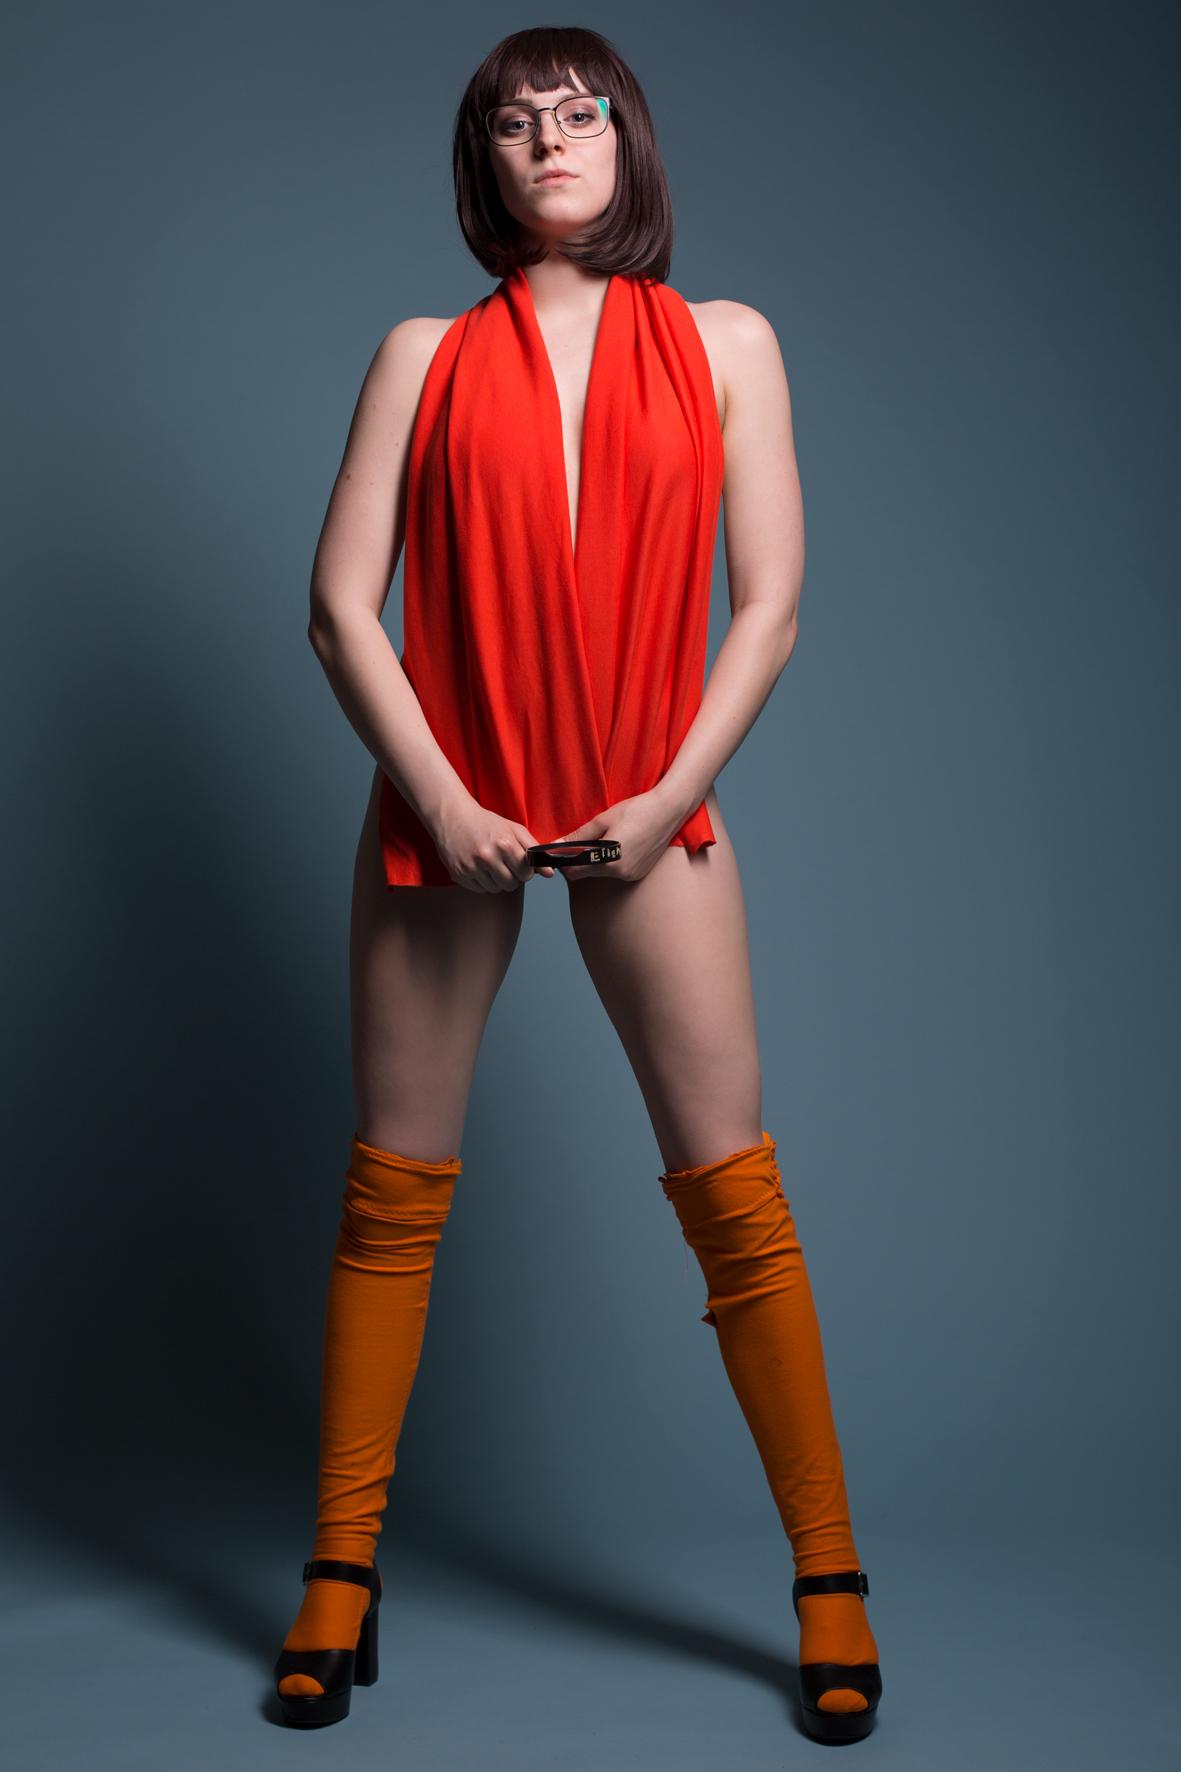 Sexy Grown Up Velma Cosplay From Scooby Doo By Officialcallmekira On Deviantart